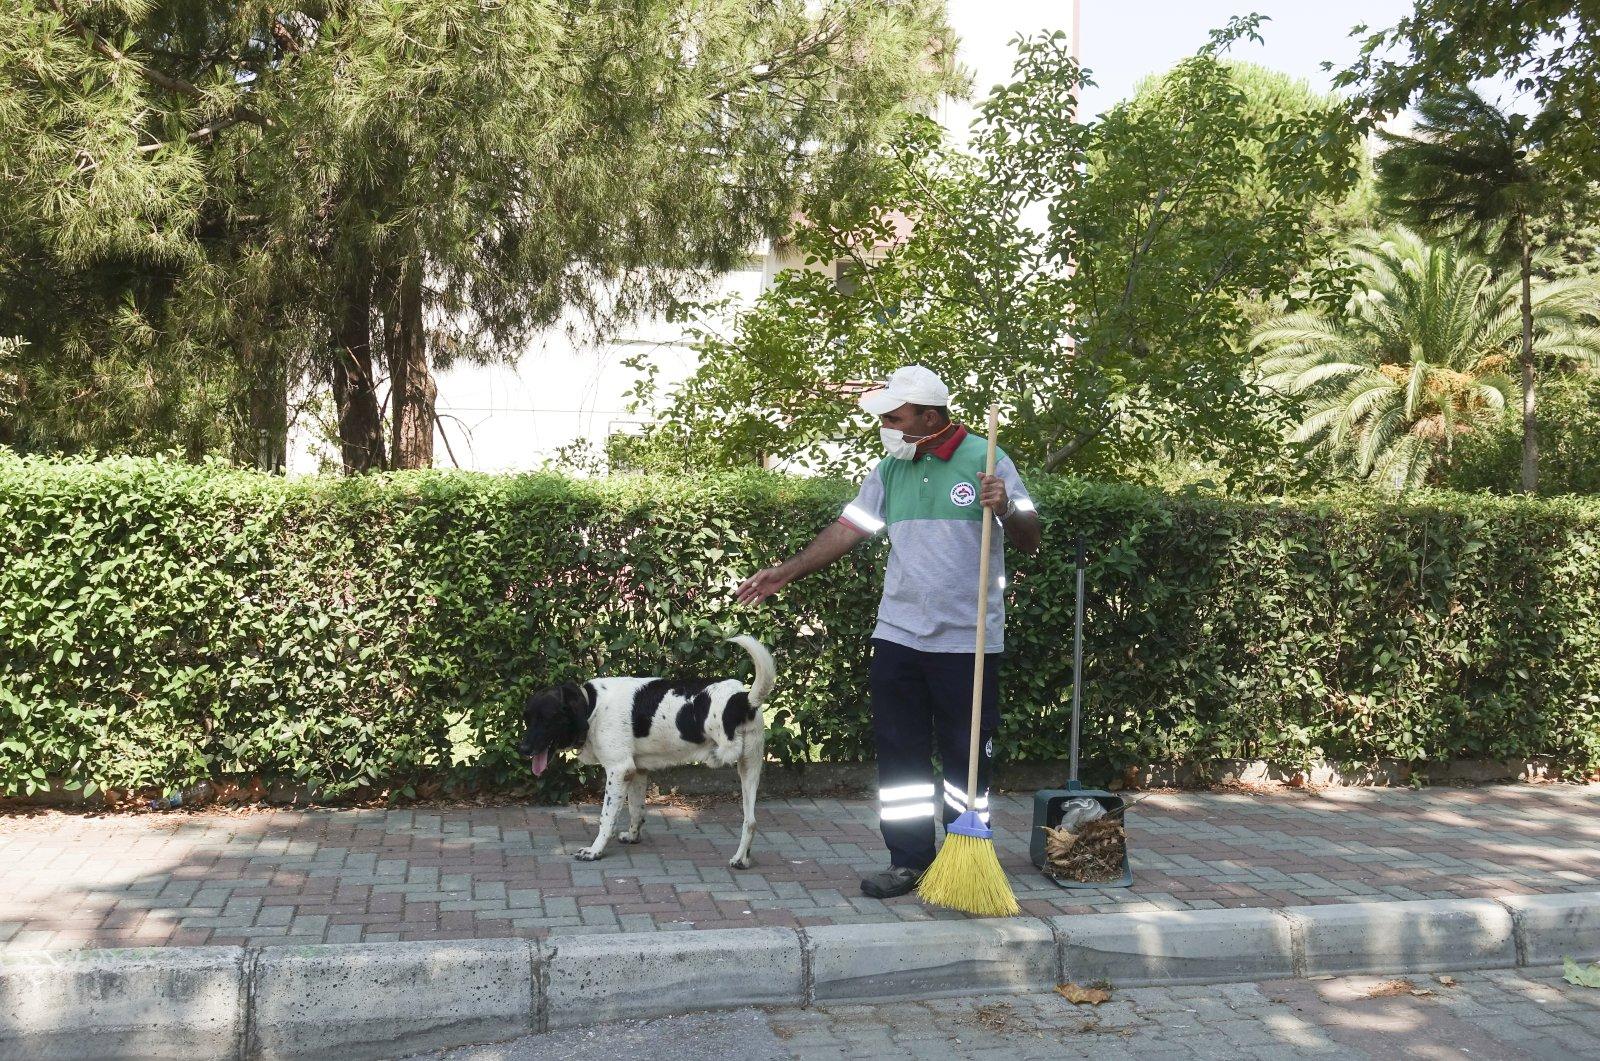 Kola the dog accompanies Mustafa Sağsöz during a regular shift in Izmir, Turkey, Aug. 8, 2020. (AA Photo)